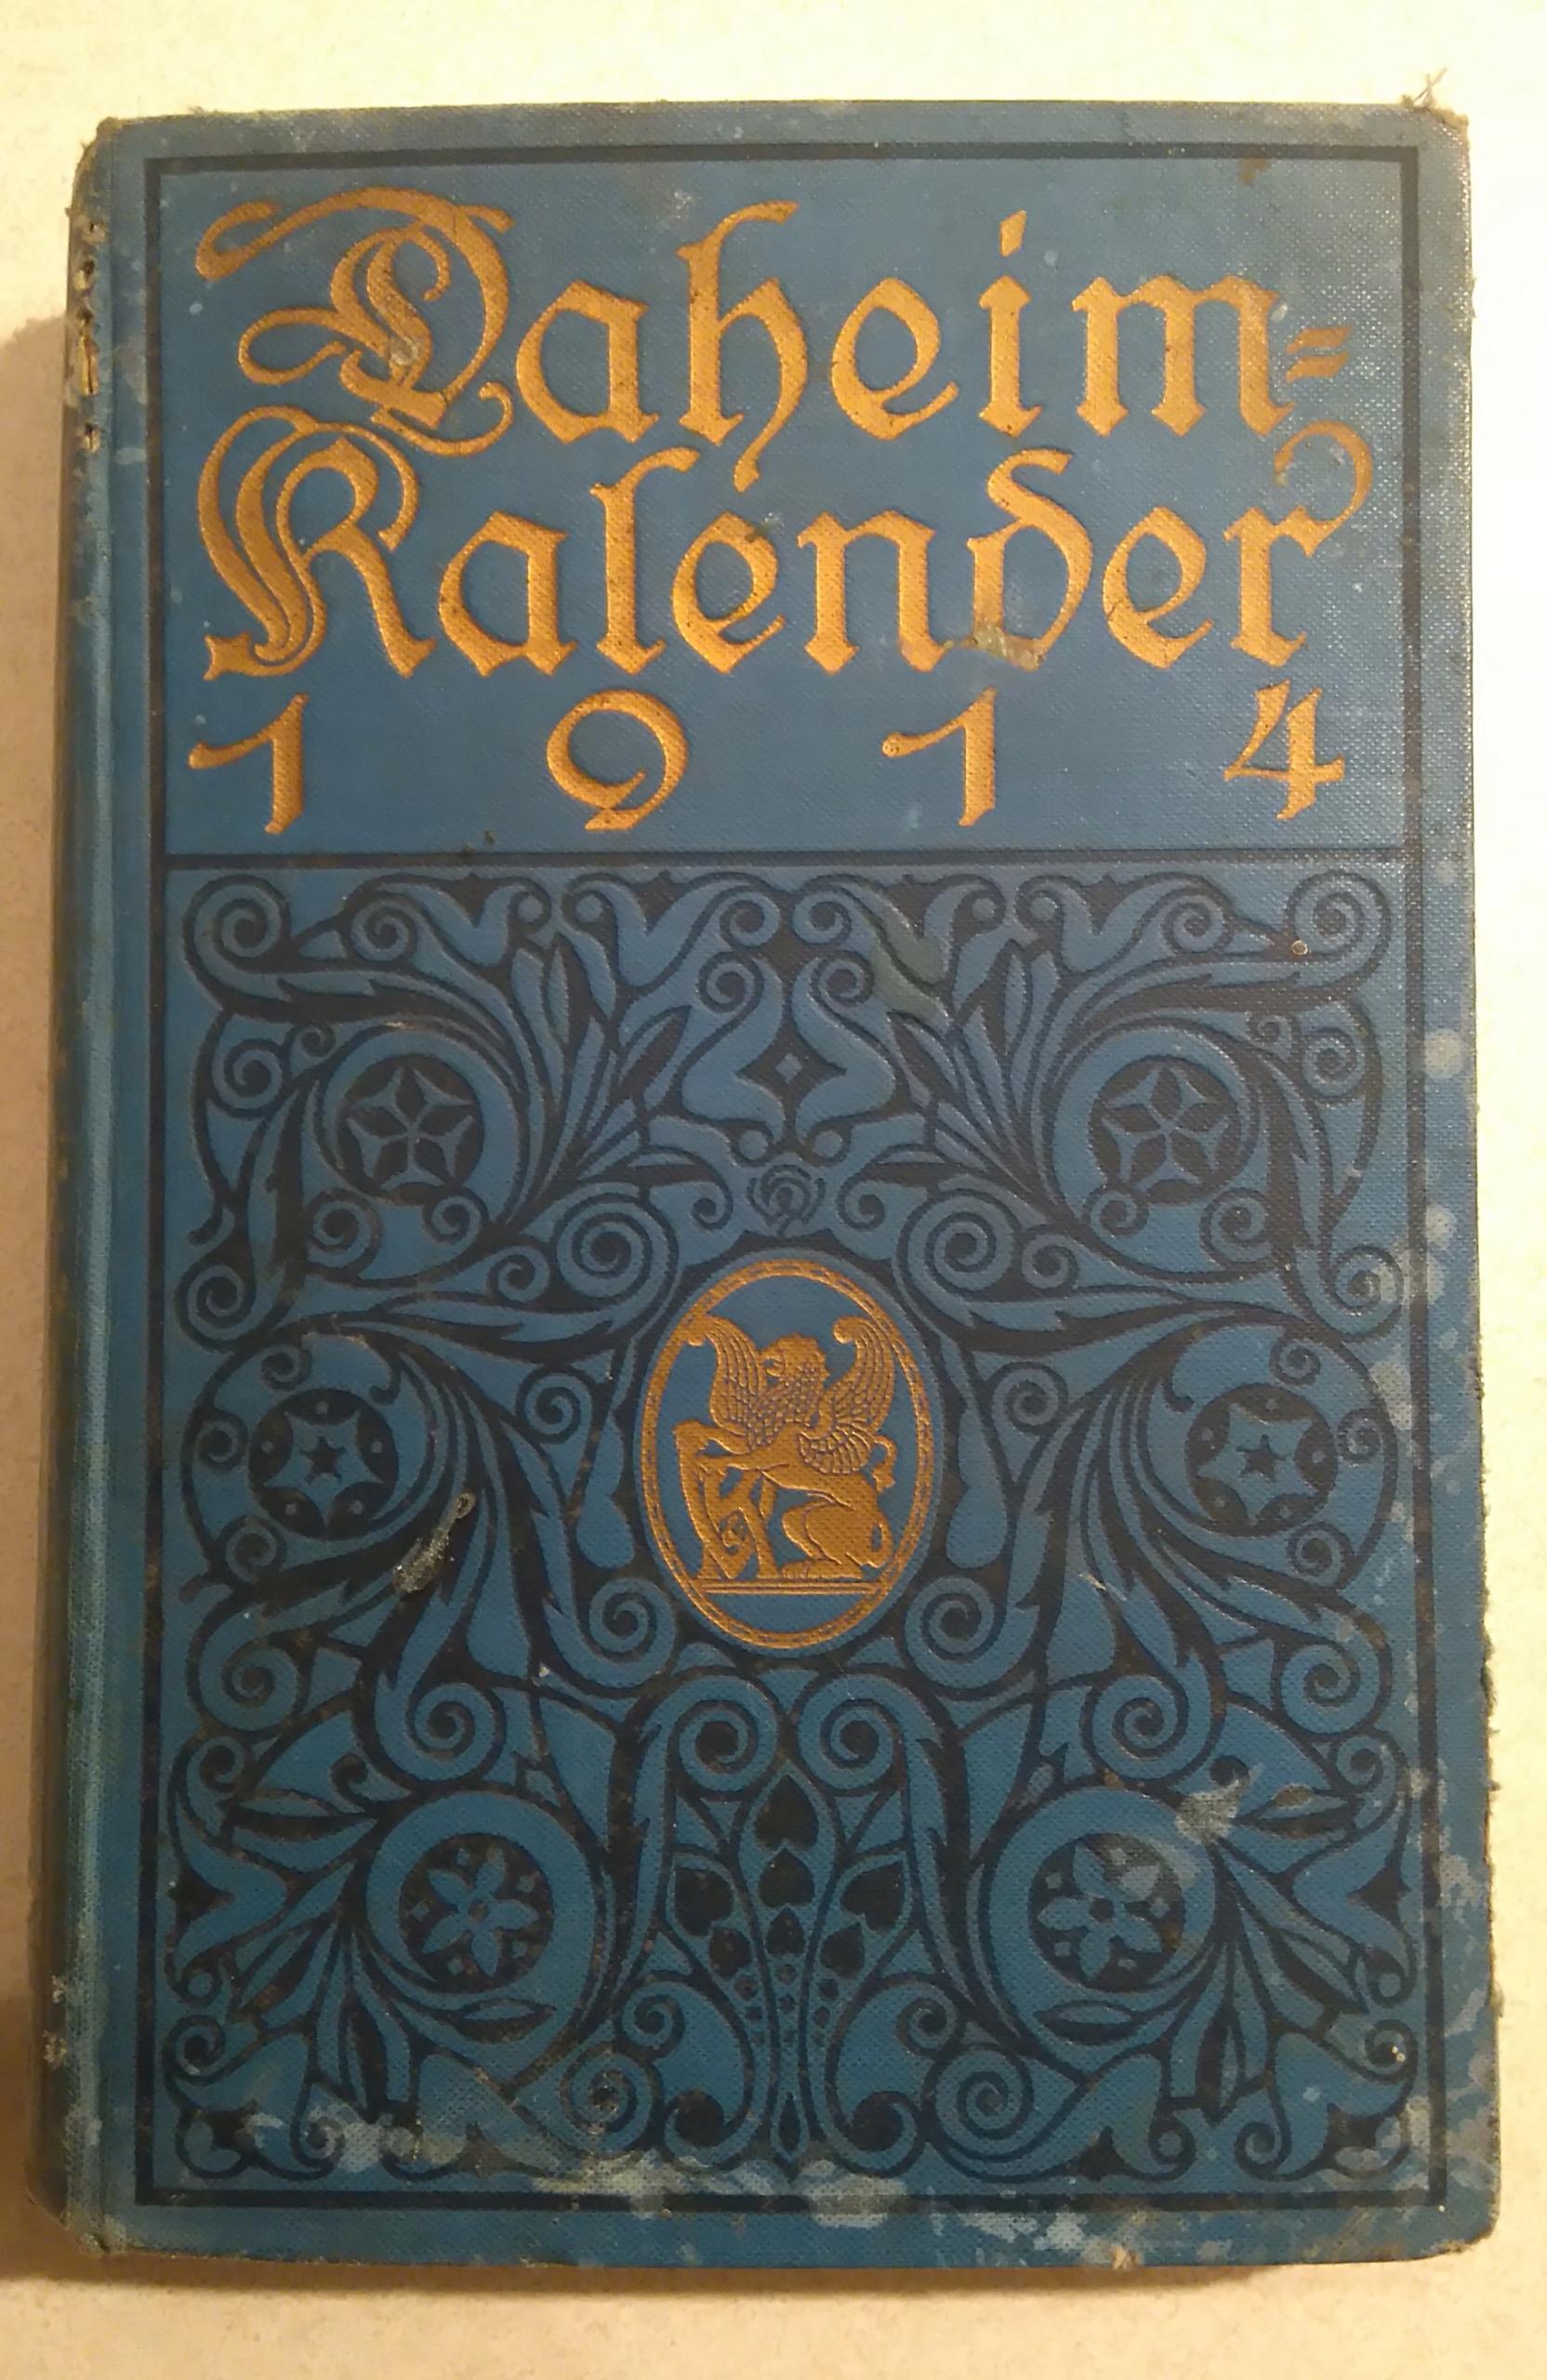 Daheim Kalender 1914, kalendarz domowy